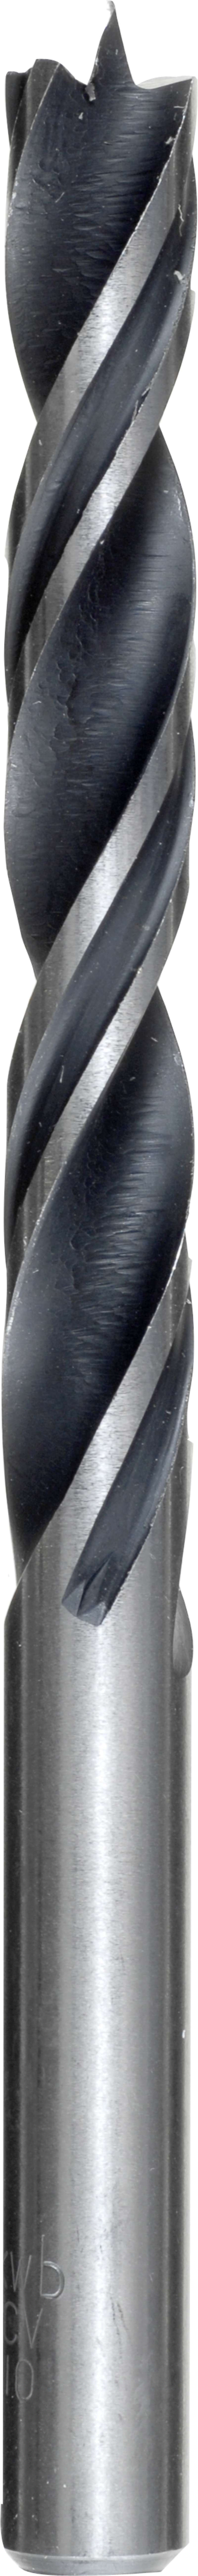 Сверло по дереву Kwb 5114-70 garmin monterra с др6